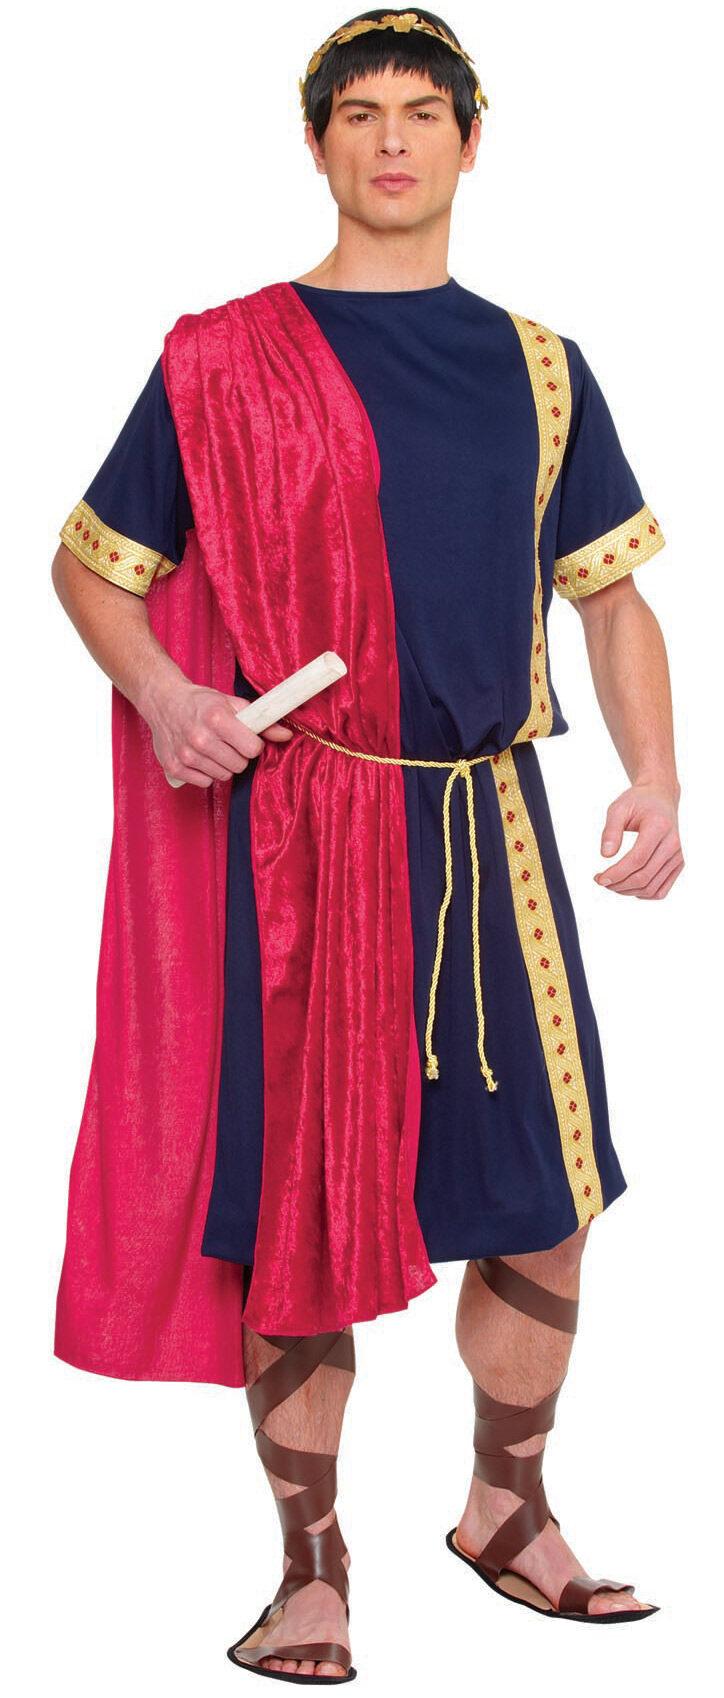 Mens Roman Senator Adult Costume - Mr. Costumes